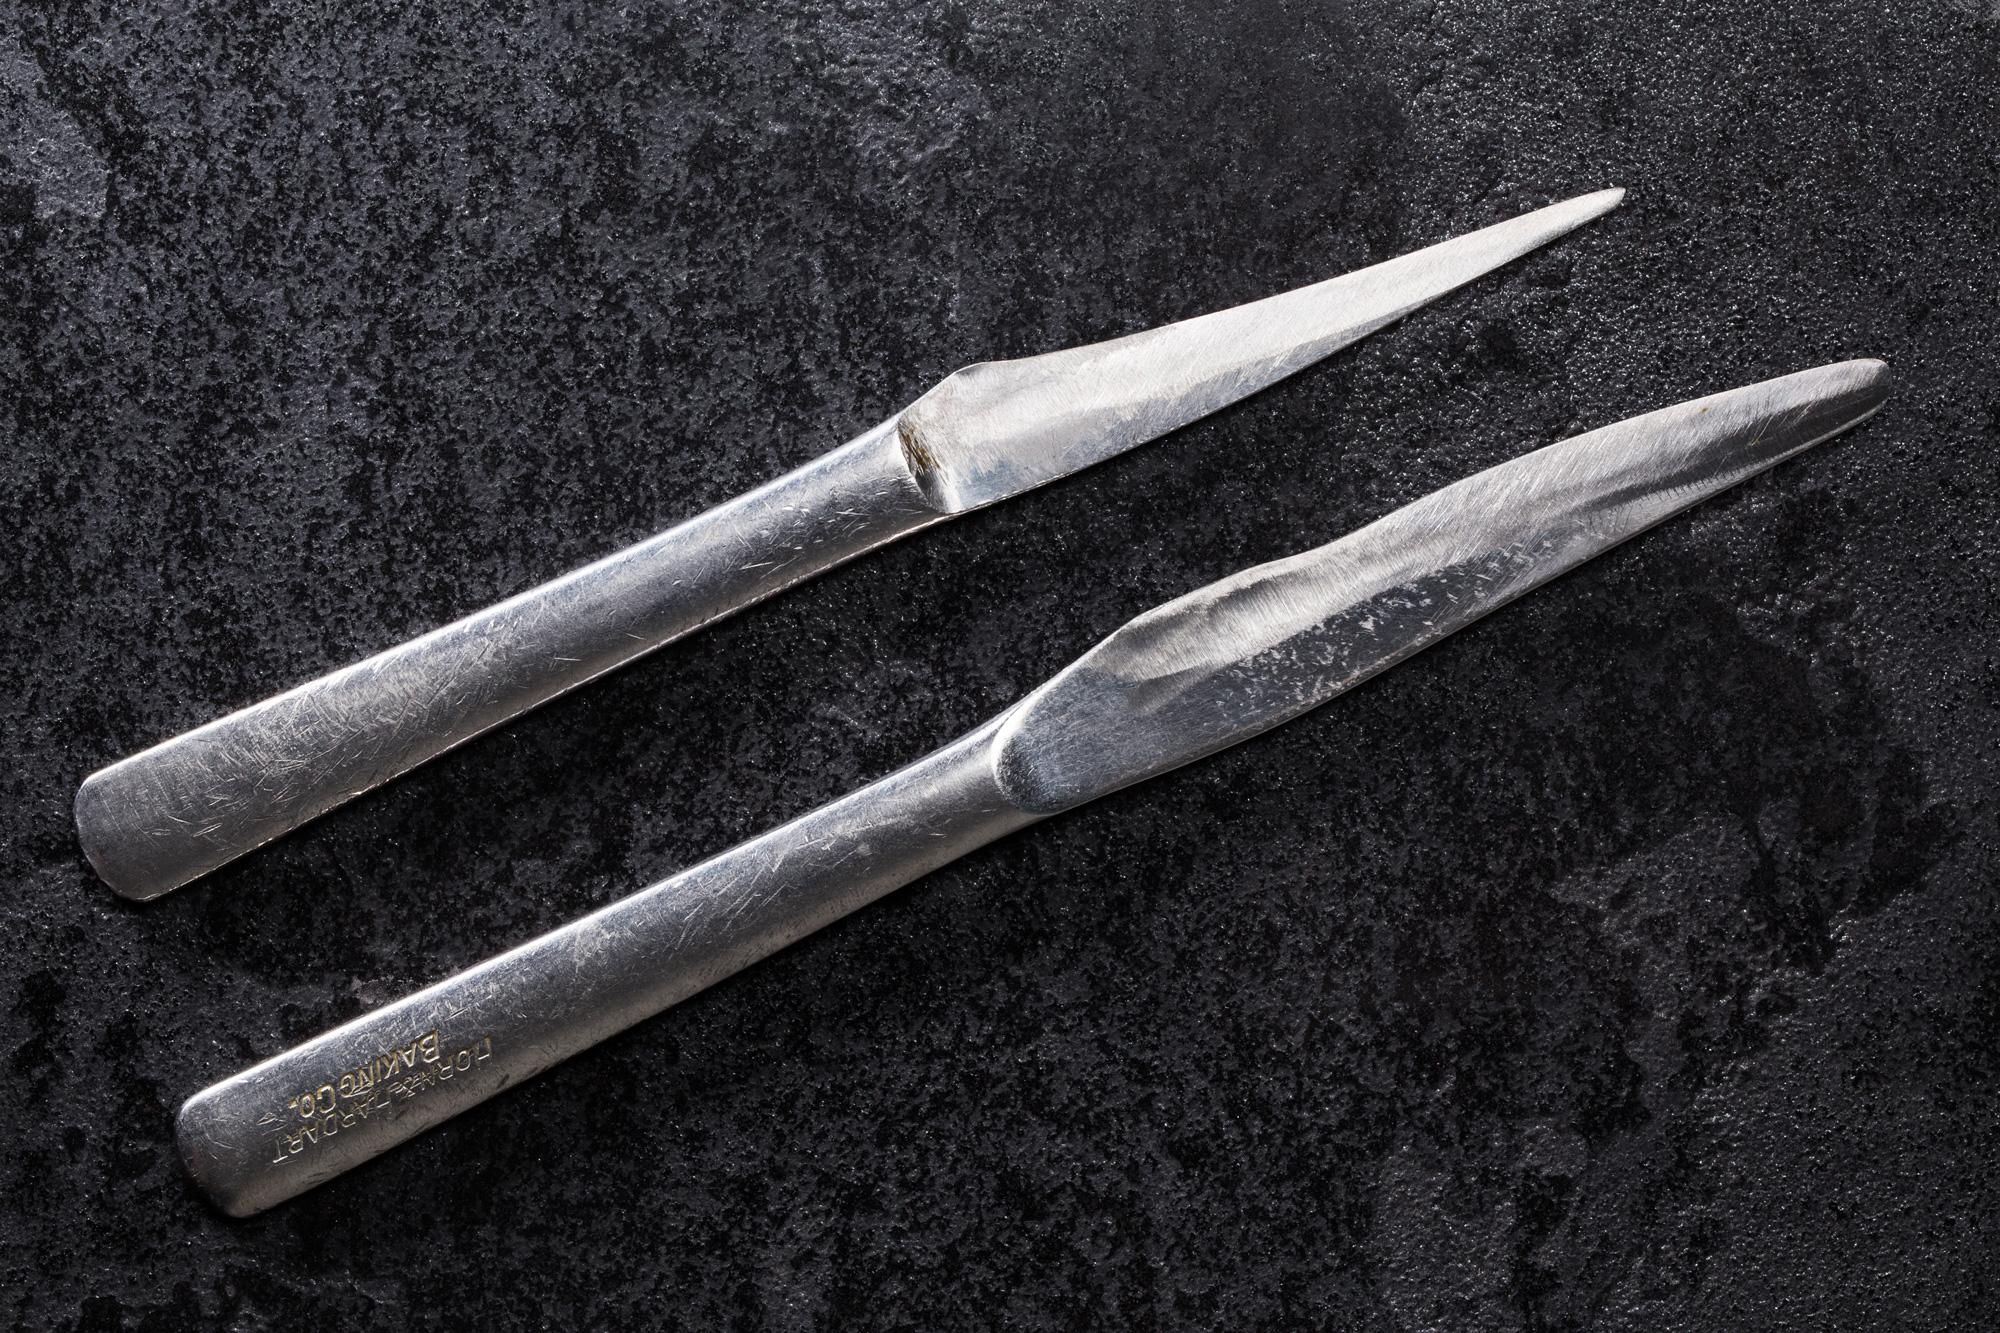 EP-03252015-adina'sknives2-6x4.jpg